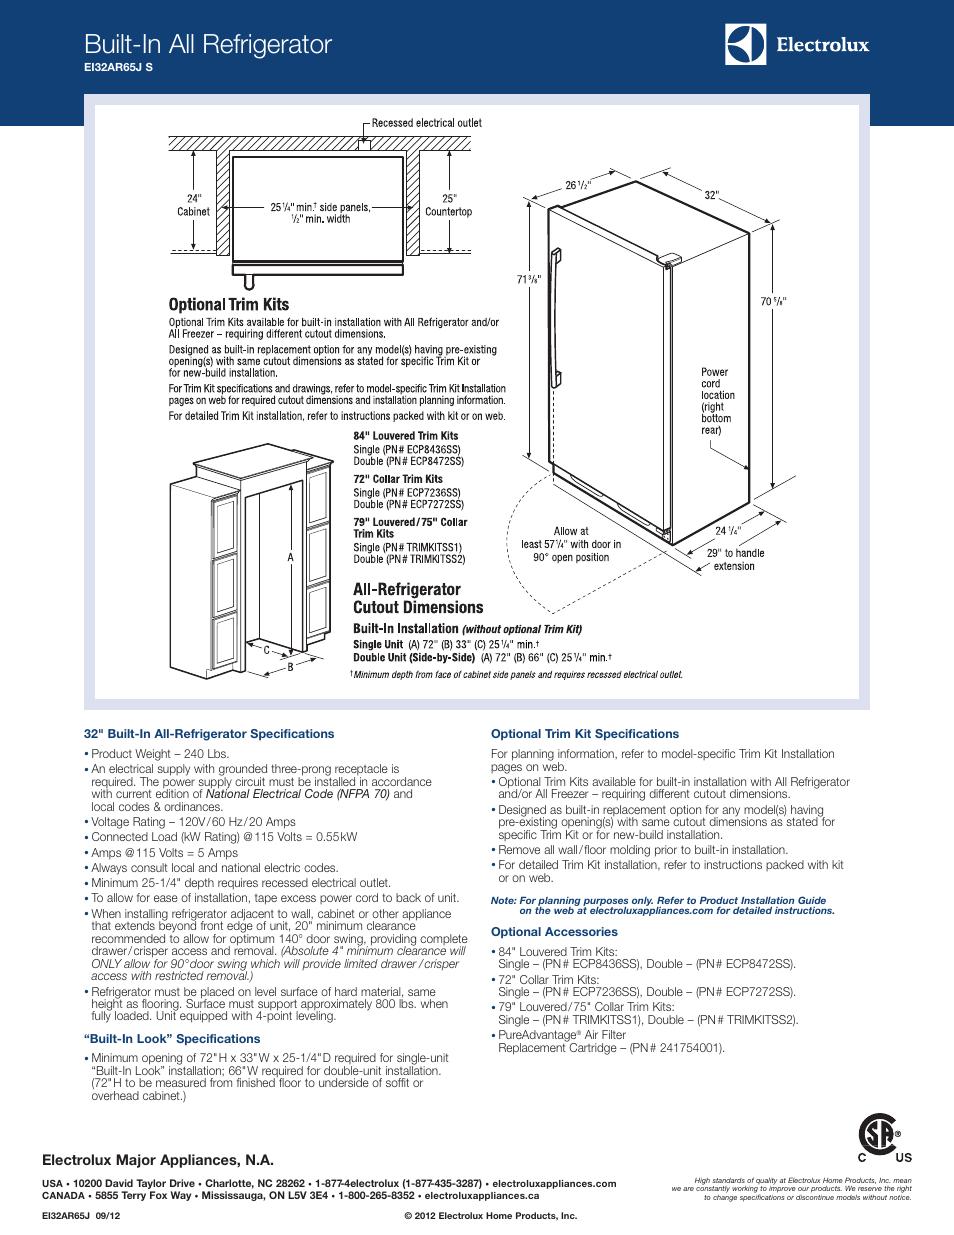 Built-in all refrigerator, Electrolux major appliances, n.a | Electrolux  EI32AR65JS User Manual